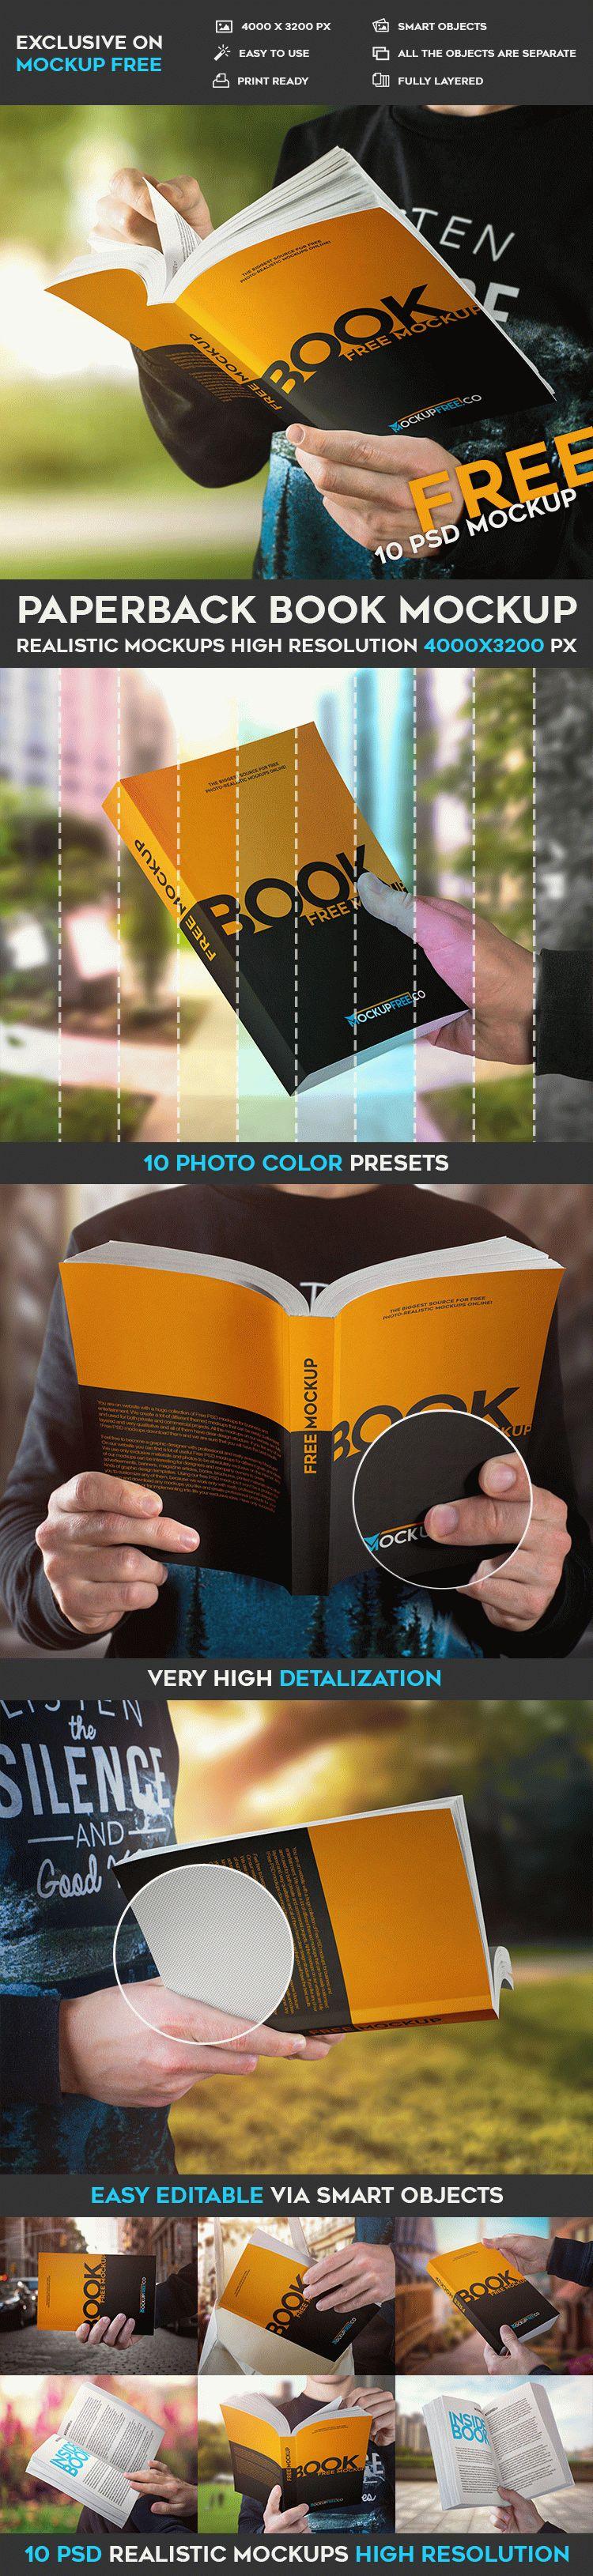 Paperback Book - 10 Free PSD Mockups